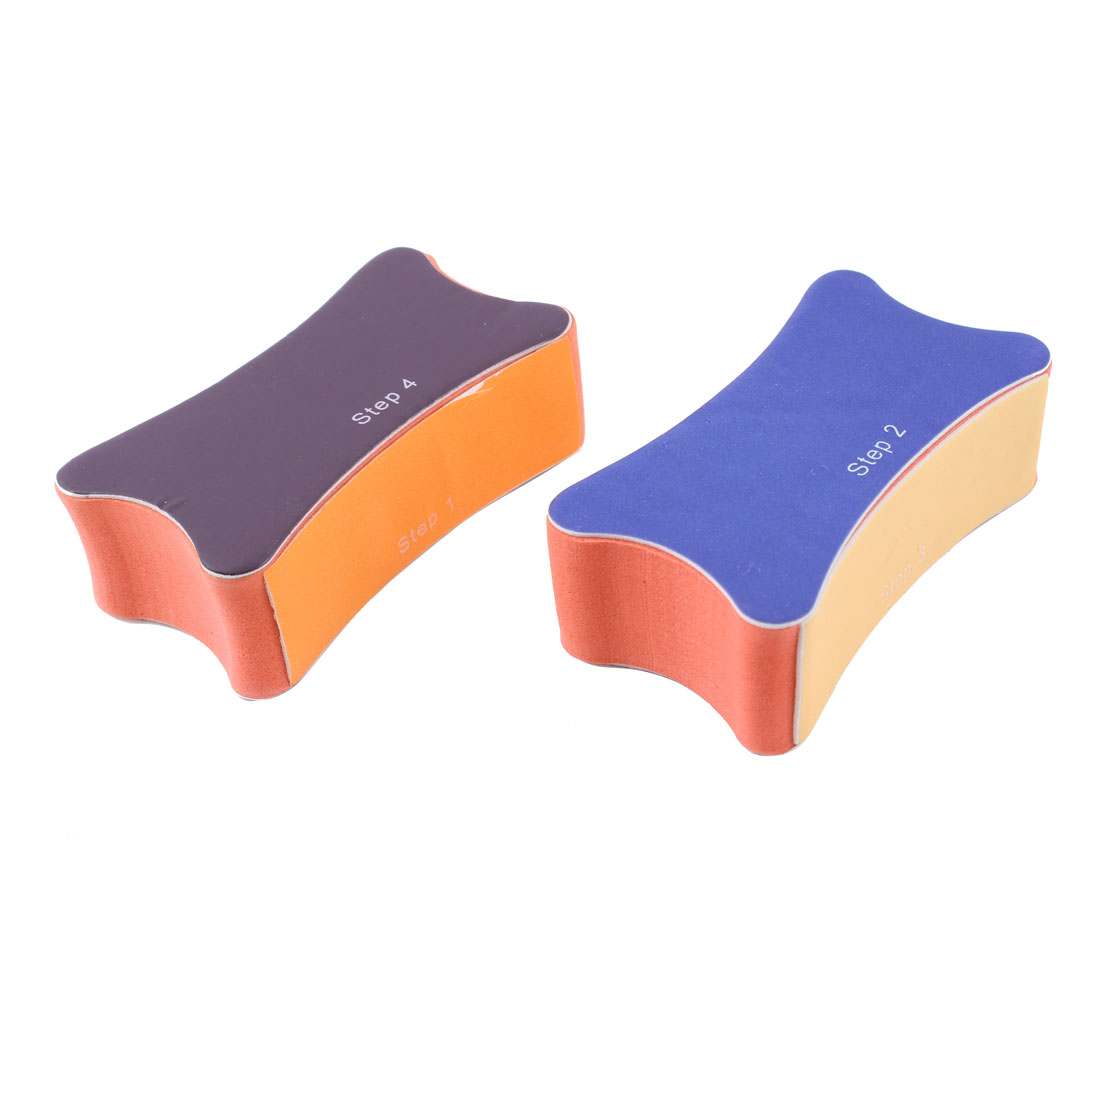 2 Pcs Beauty Tool Purple Blue Manicure Polish Shine Buffer Nail Sanding File